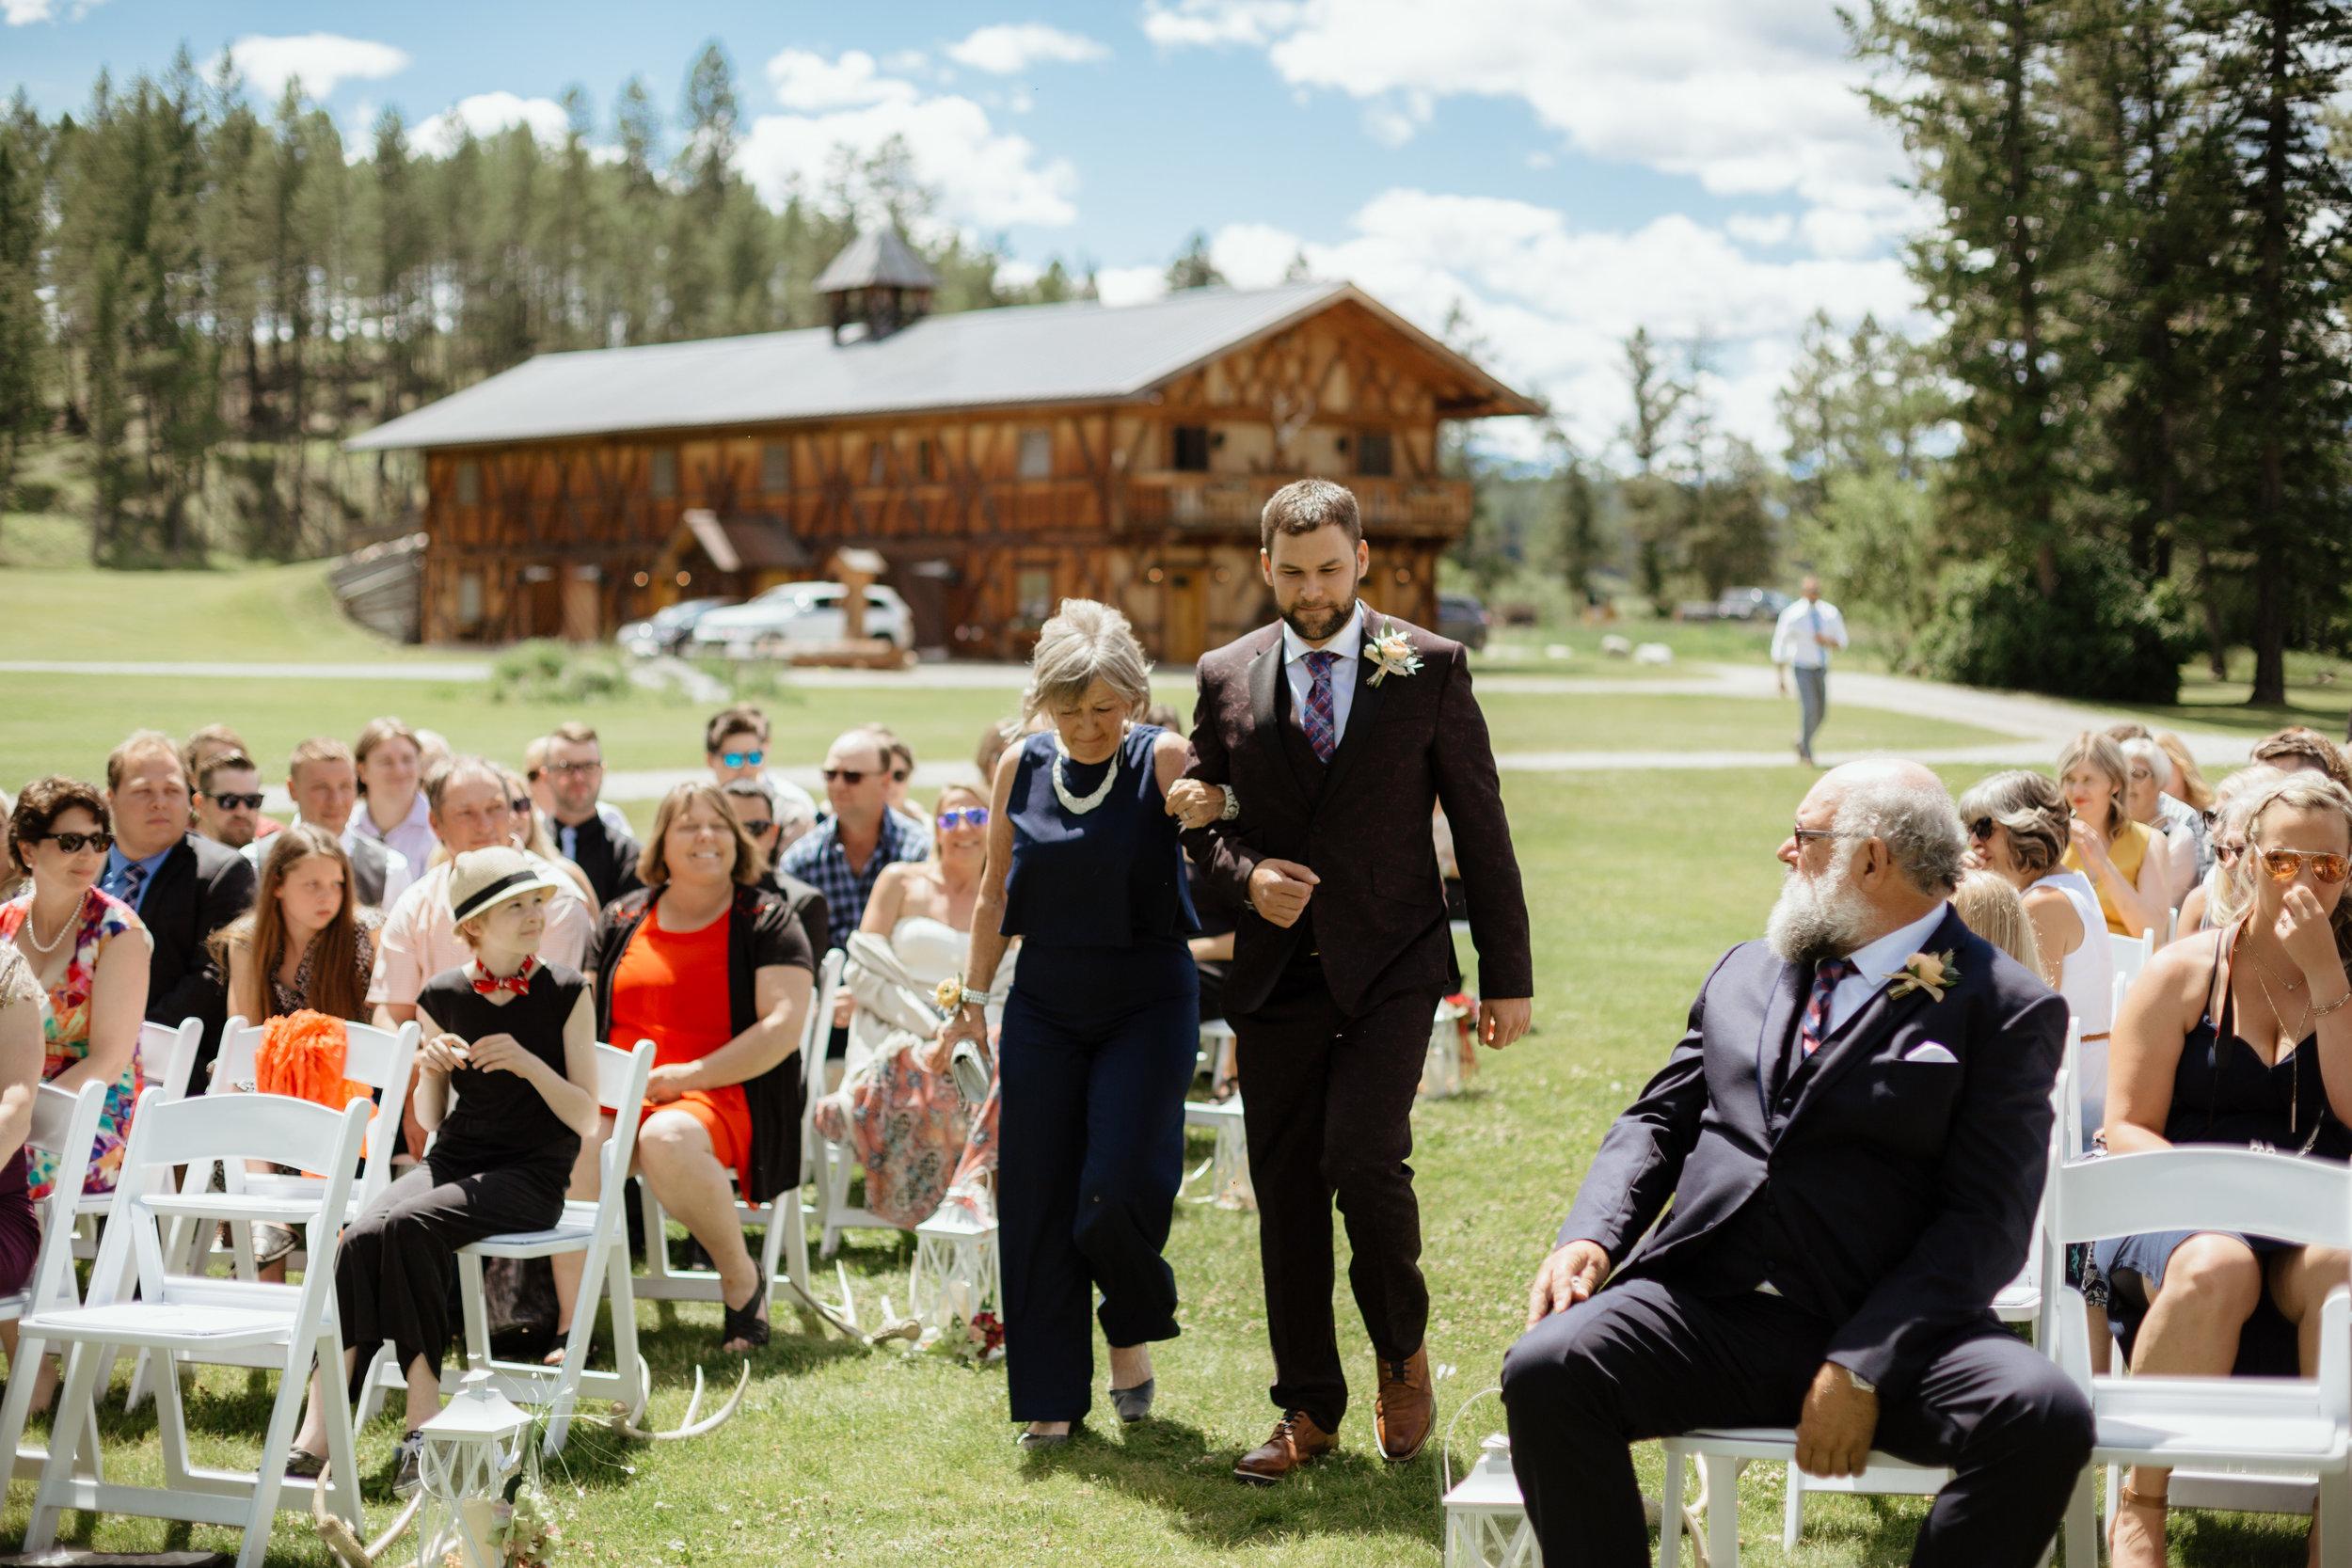 Dave + Amanda 2 - Ceremony-7.jpg